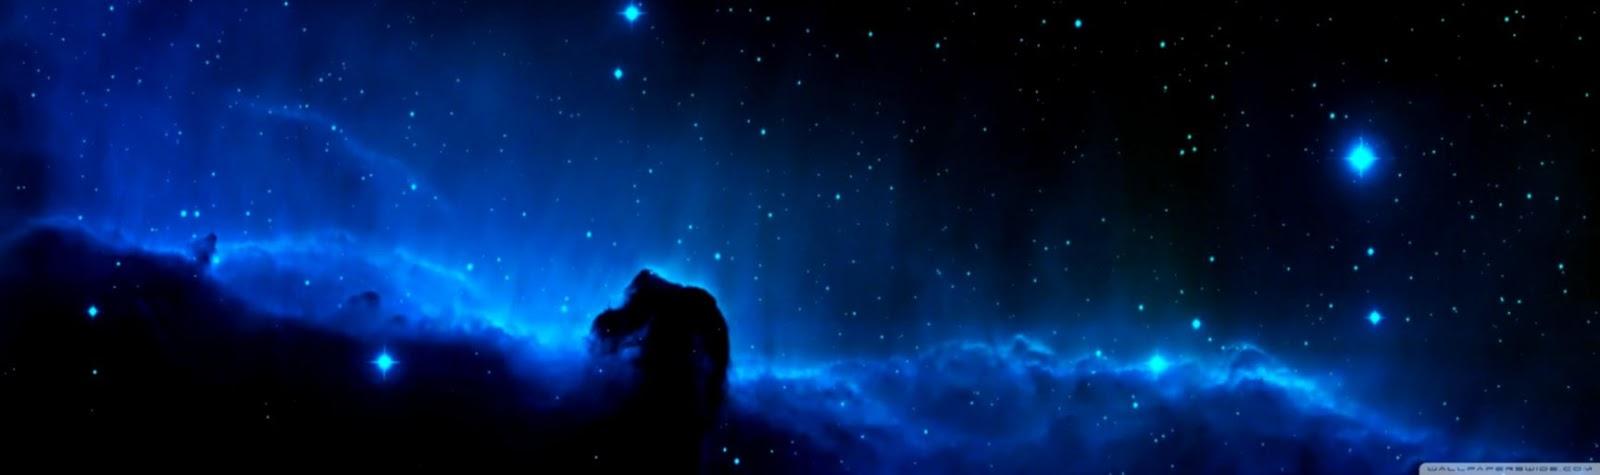 Horsehead Nebula 4k Hd Desktop Wallpaper For Dual 1080p Wallpaper Space Dual Monitor 1600x475 Wallpaper Teahub Io